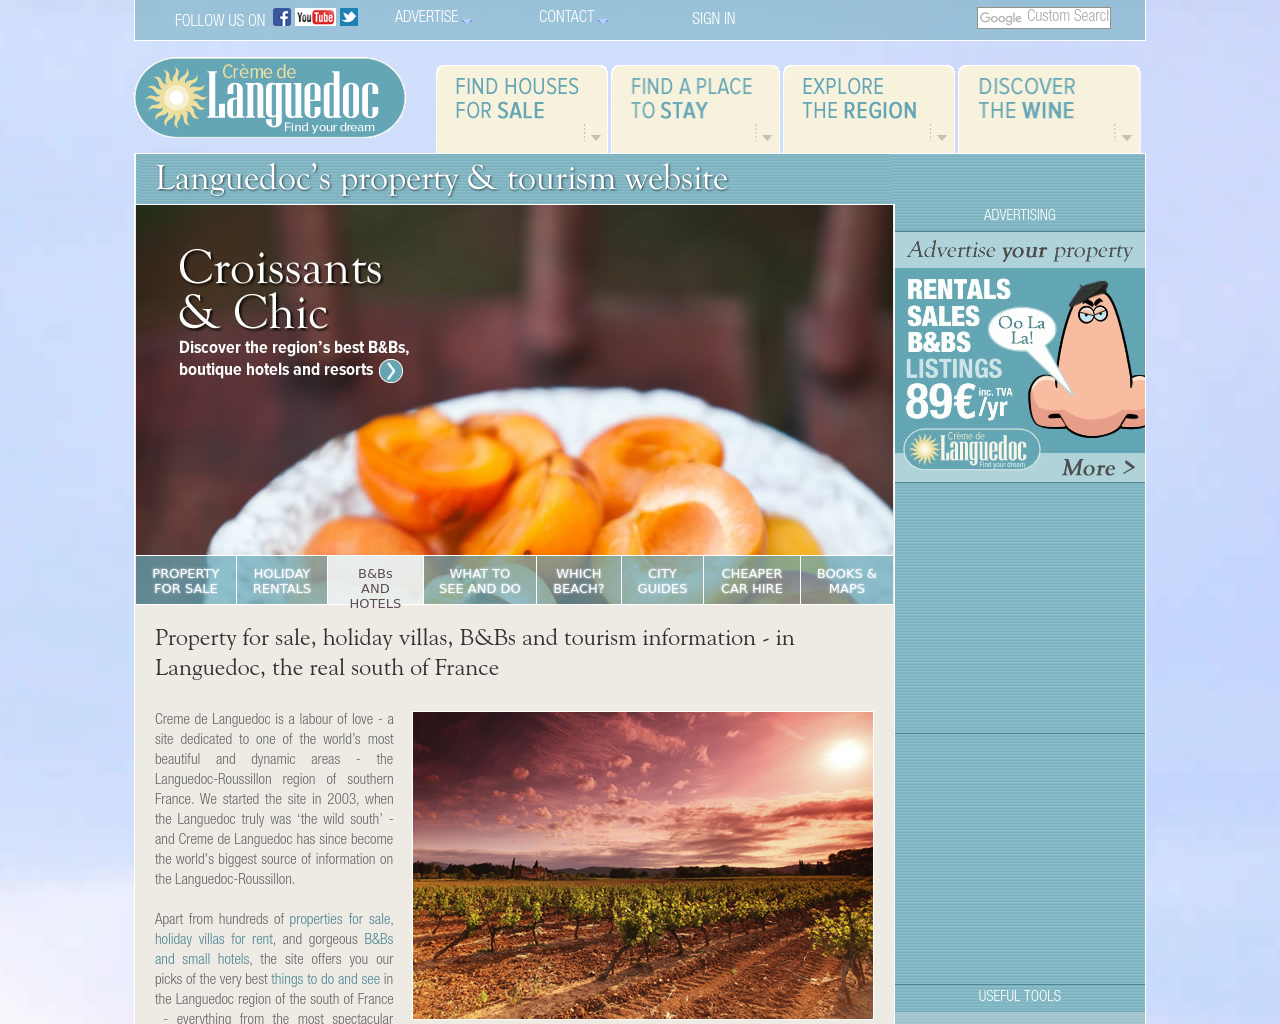 Creme-de-languedoc.com-Advertising-Reviews-Pricing